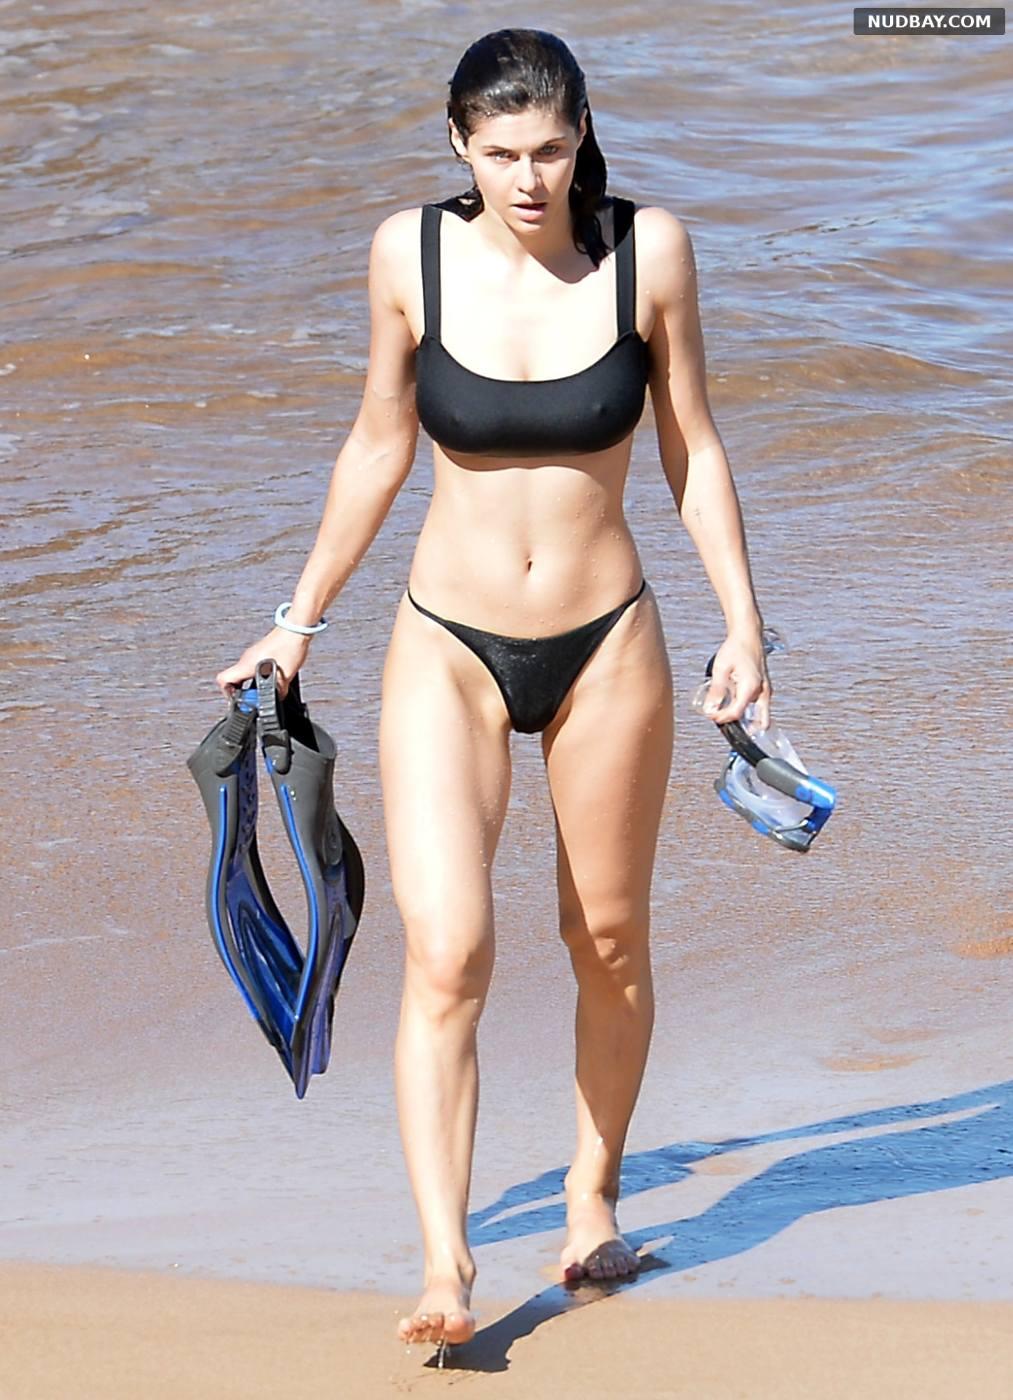 Alexandra Daddario in a black bikini on the beach in Maui Hawaii Dec 01 2020